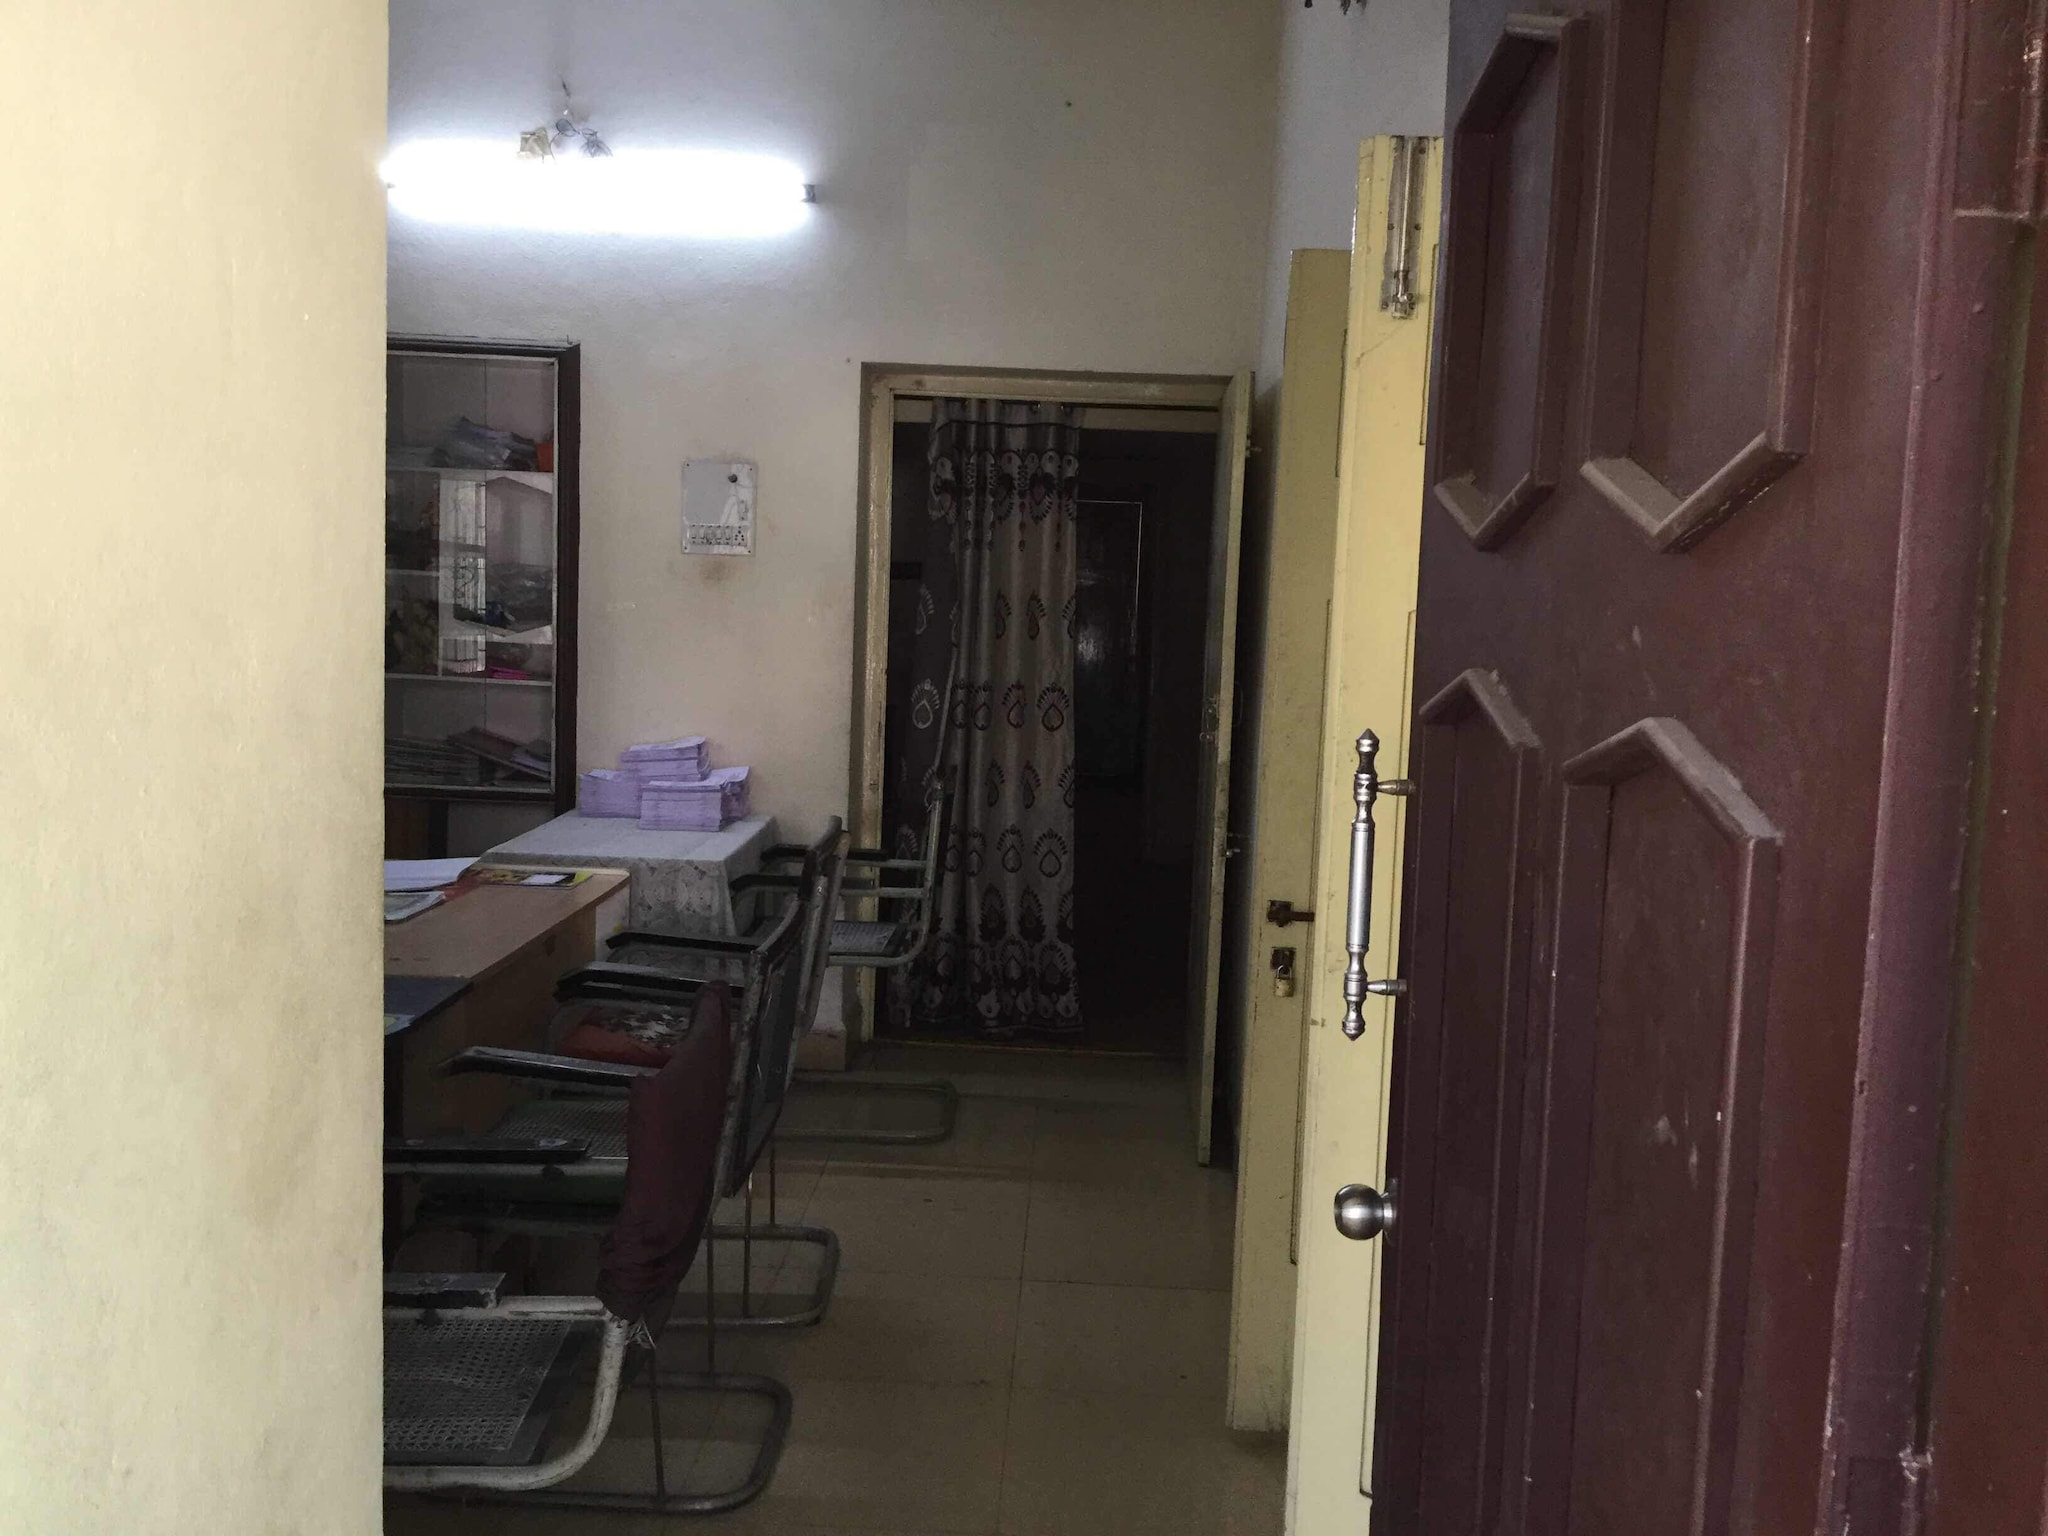 Top Matrimonial Bureaus For Mudaliar in Hyderabad - Best Matrimonial